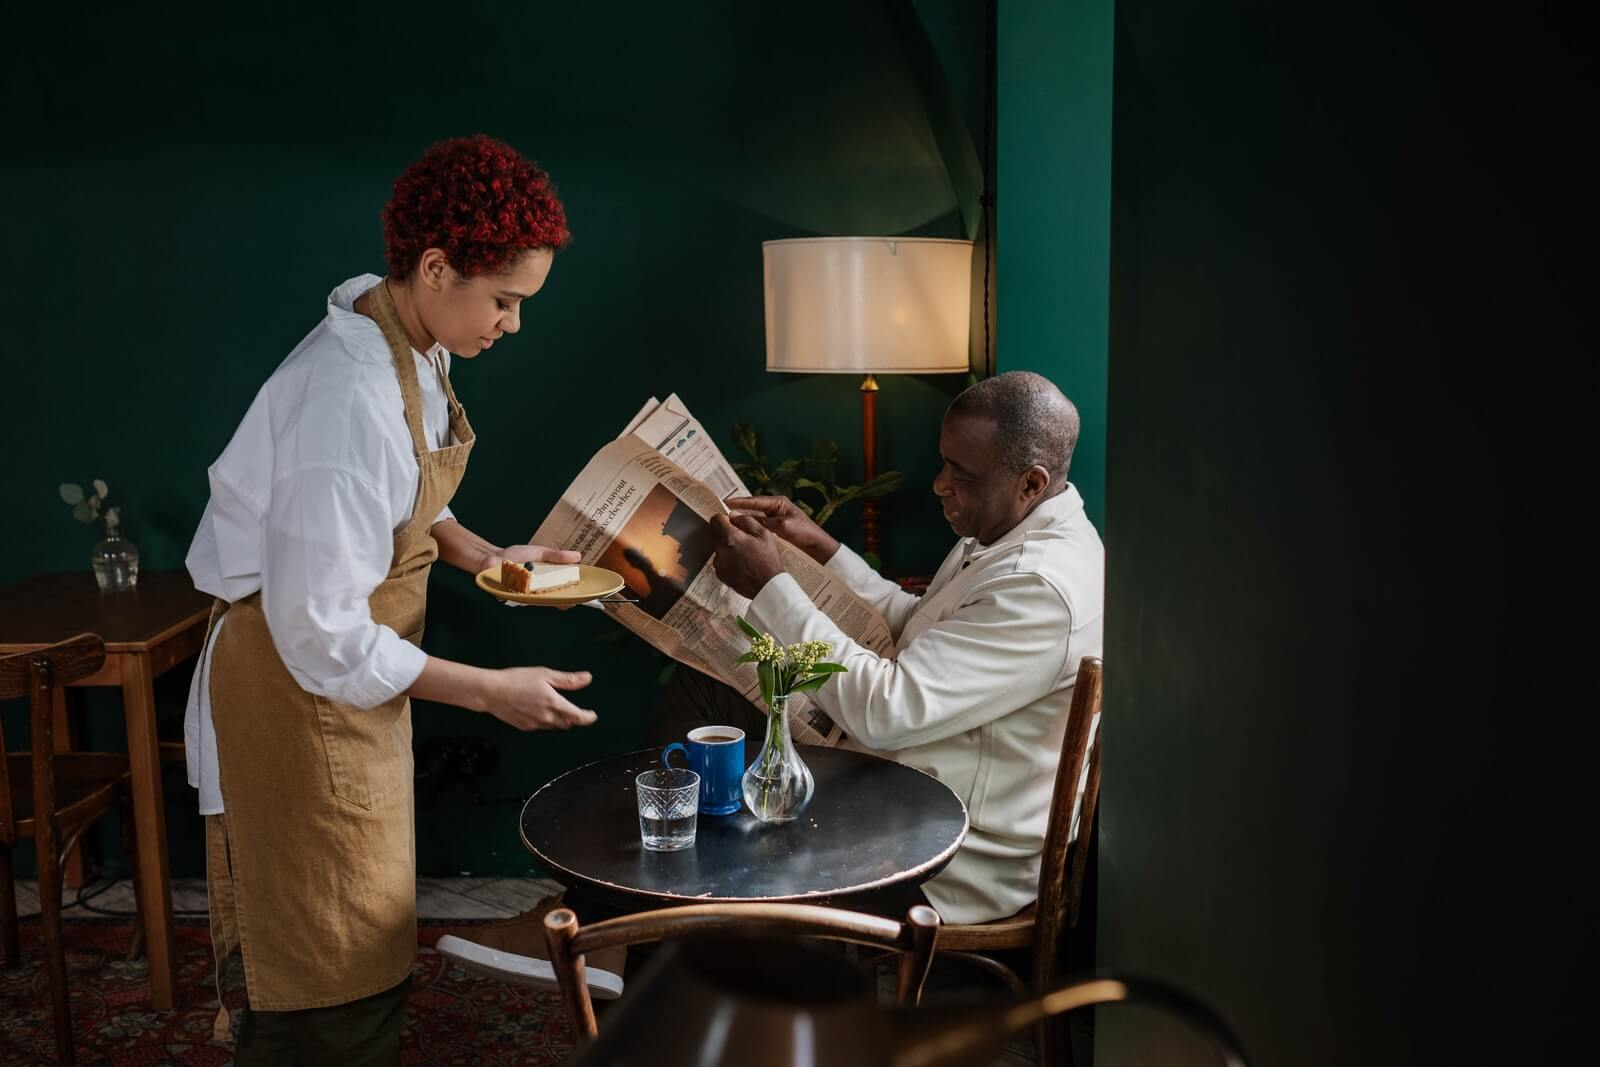 waitress serves customer at restaurant